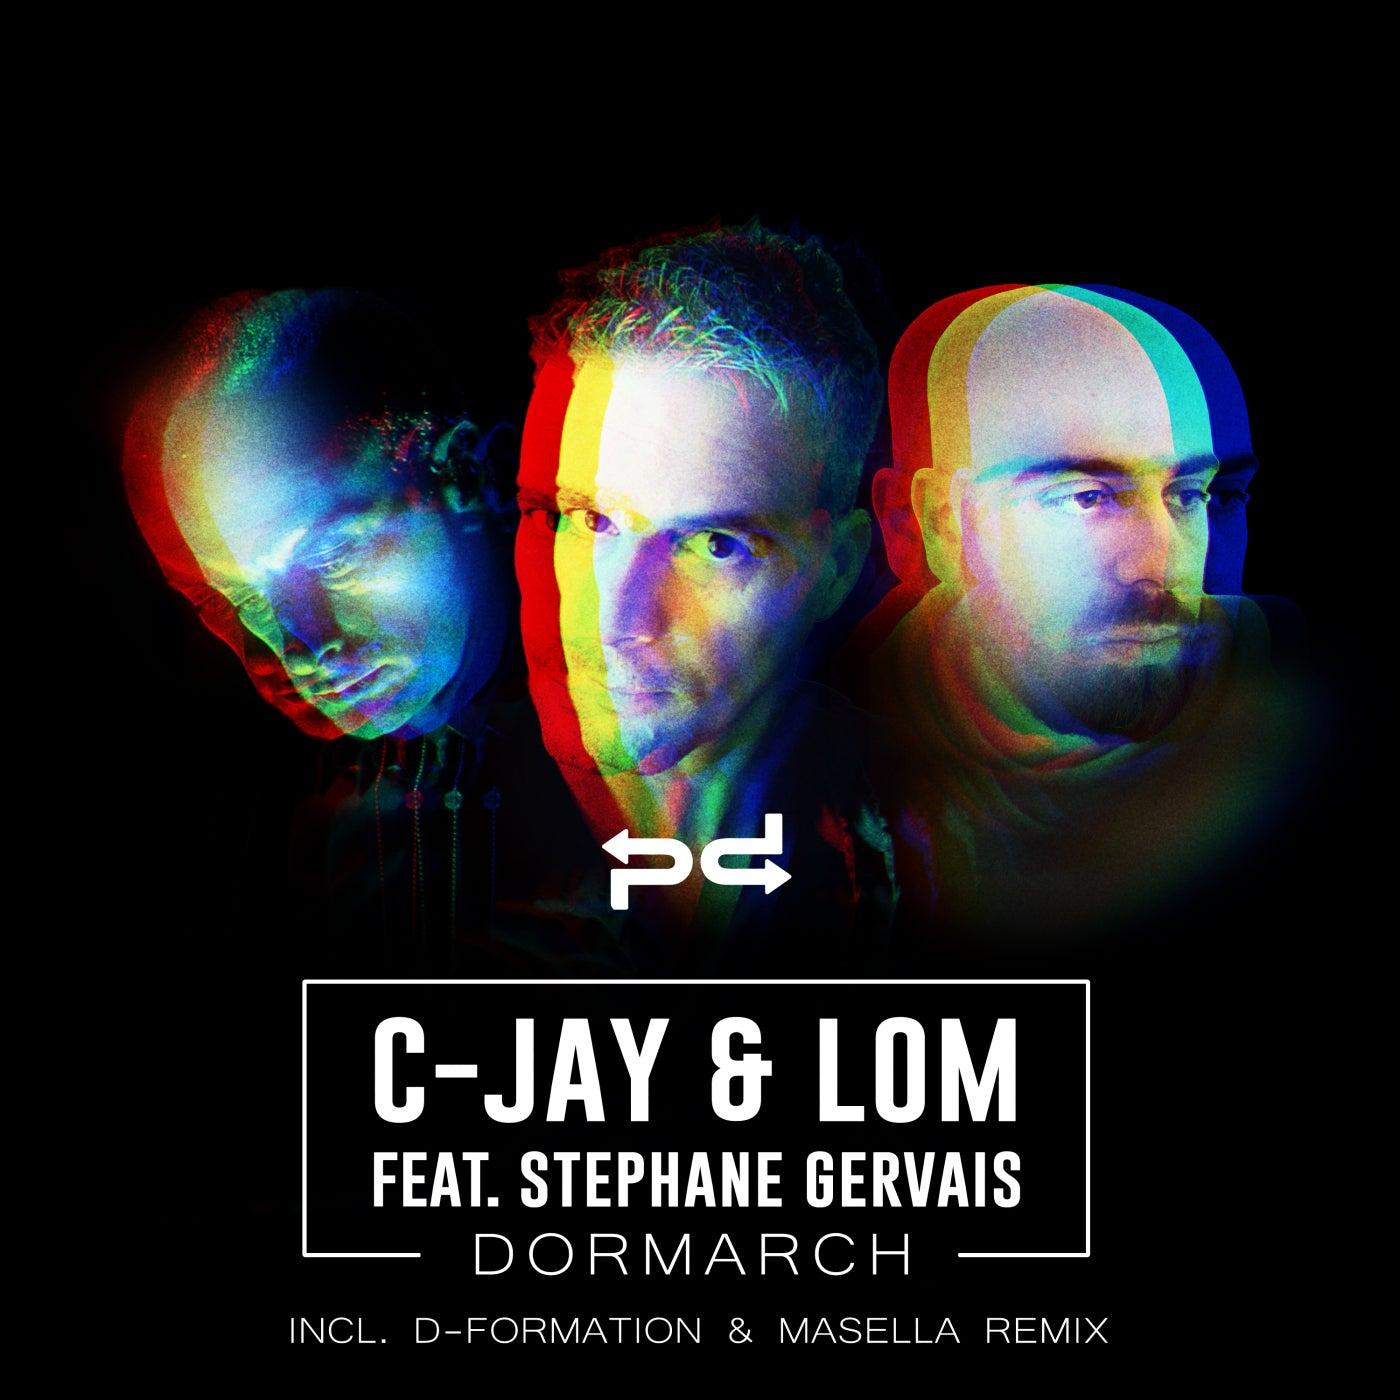 Dormarch (D-Formation & Masella Remix)